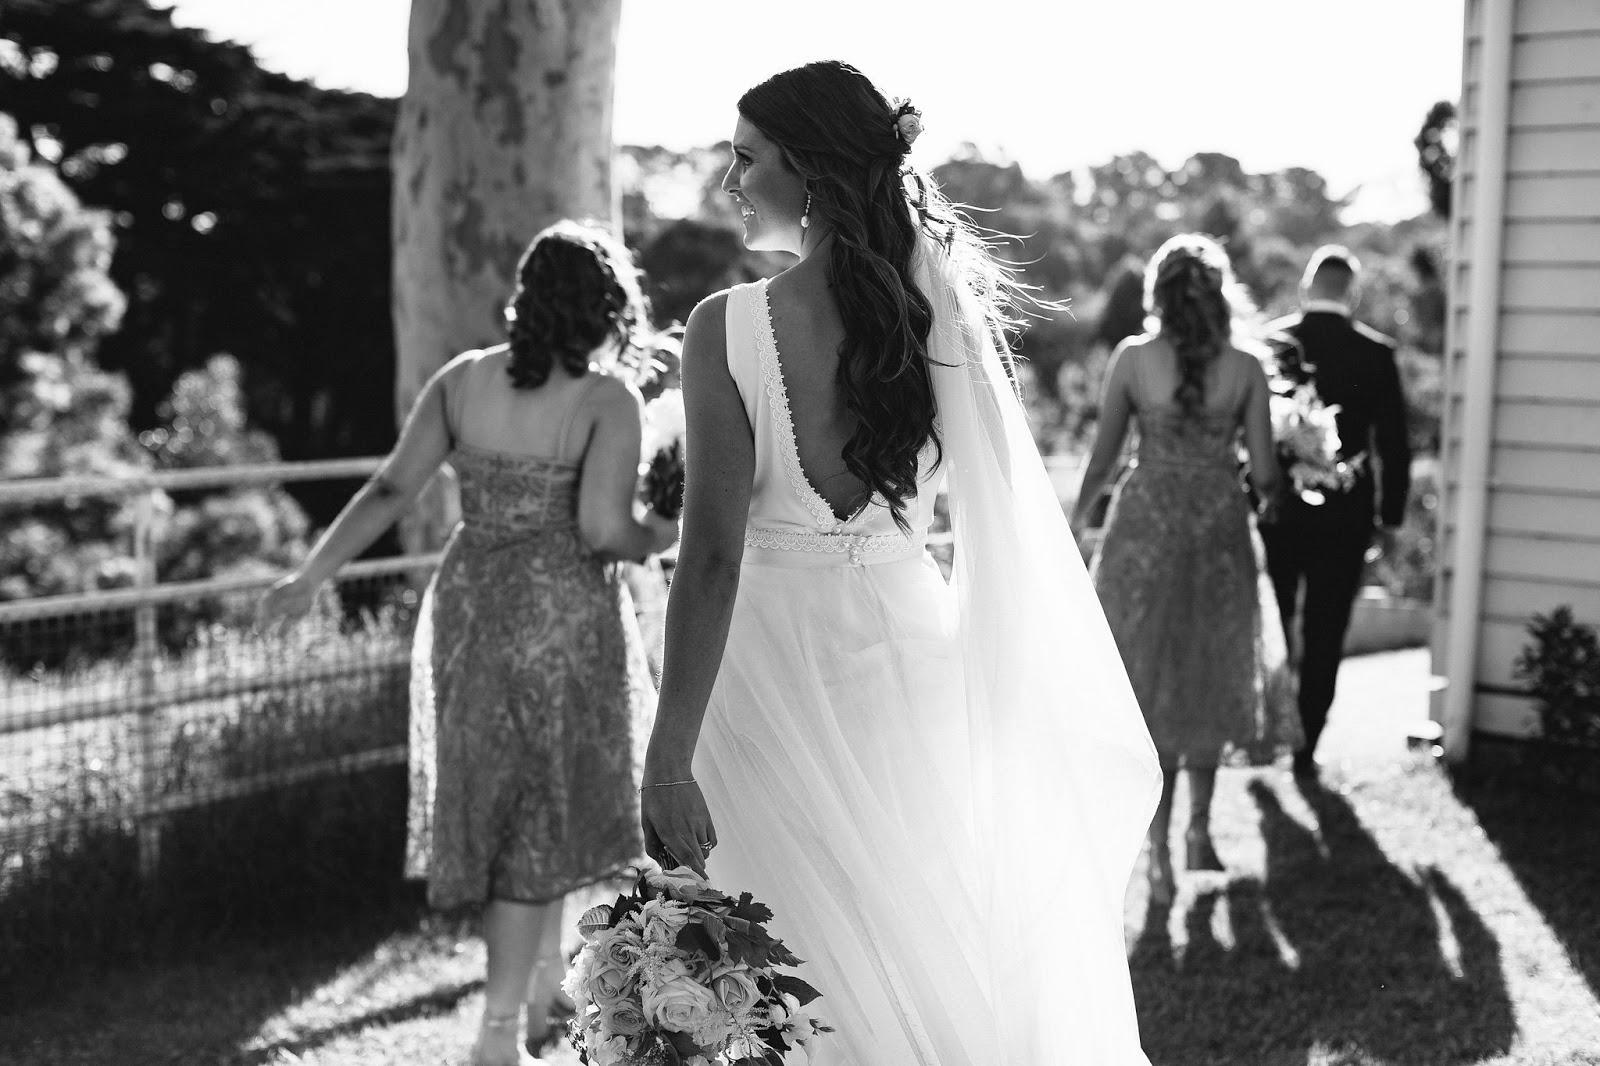 vanessa morris photographer photography mornington peninsula wedding venue melbourne